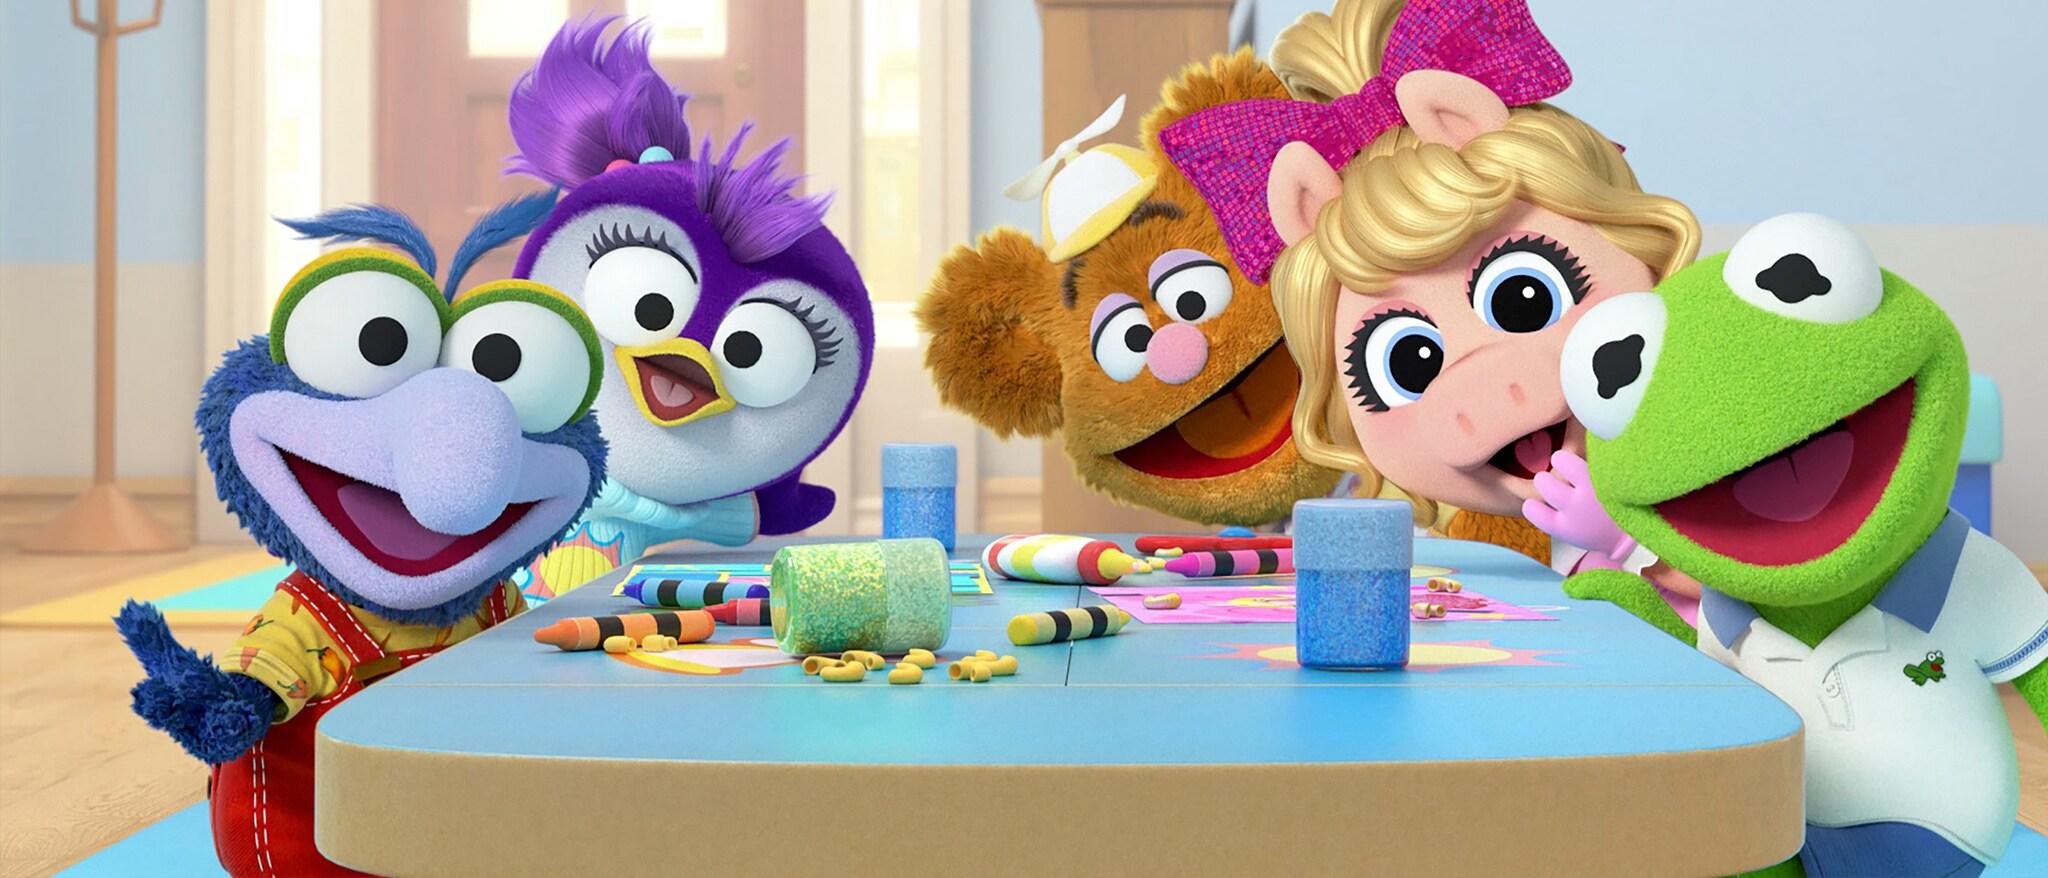 Muppet Babies hero